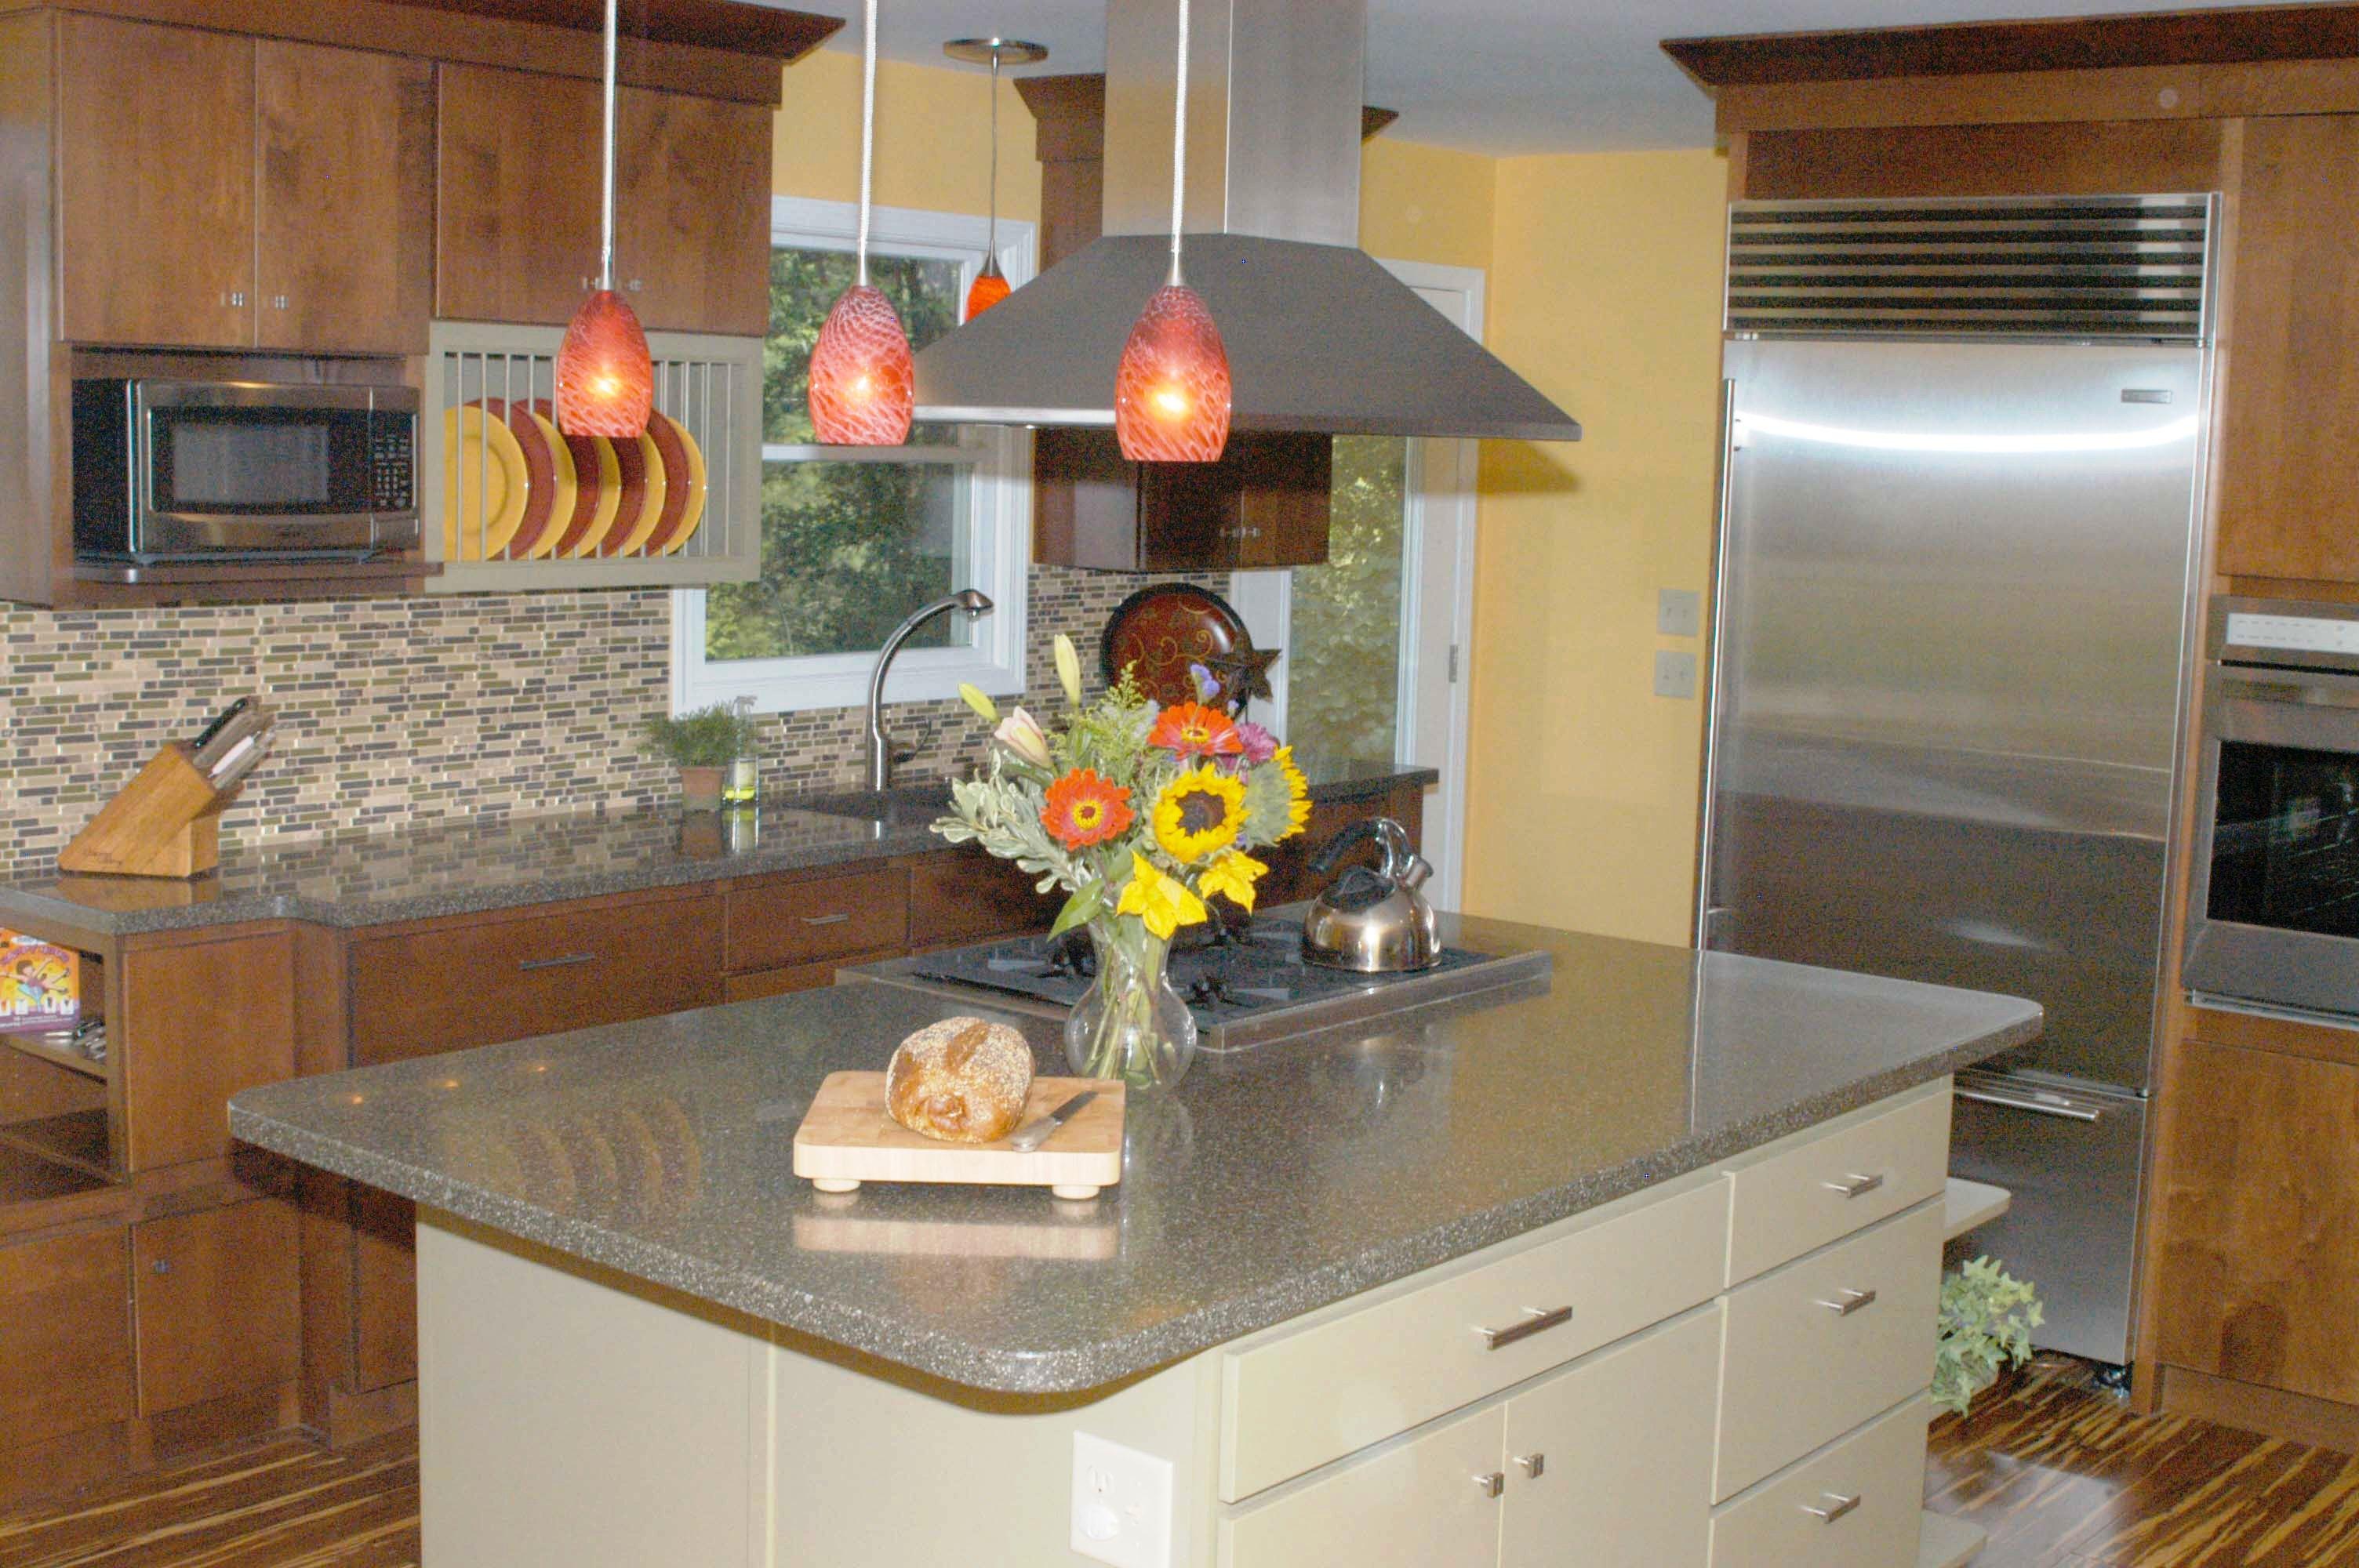 Dreammaker Bath Kitchen Of Greater Grand Rapids Comstock Park MI 493